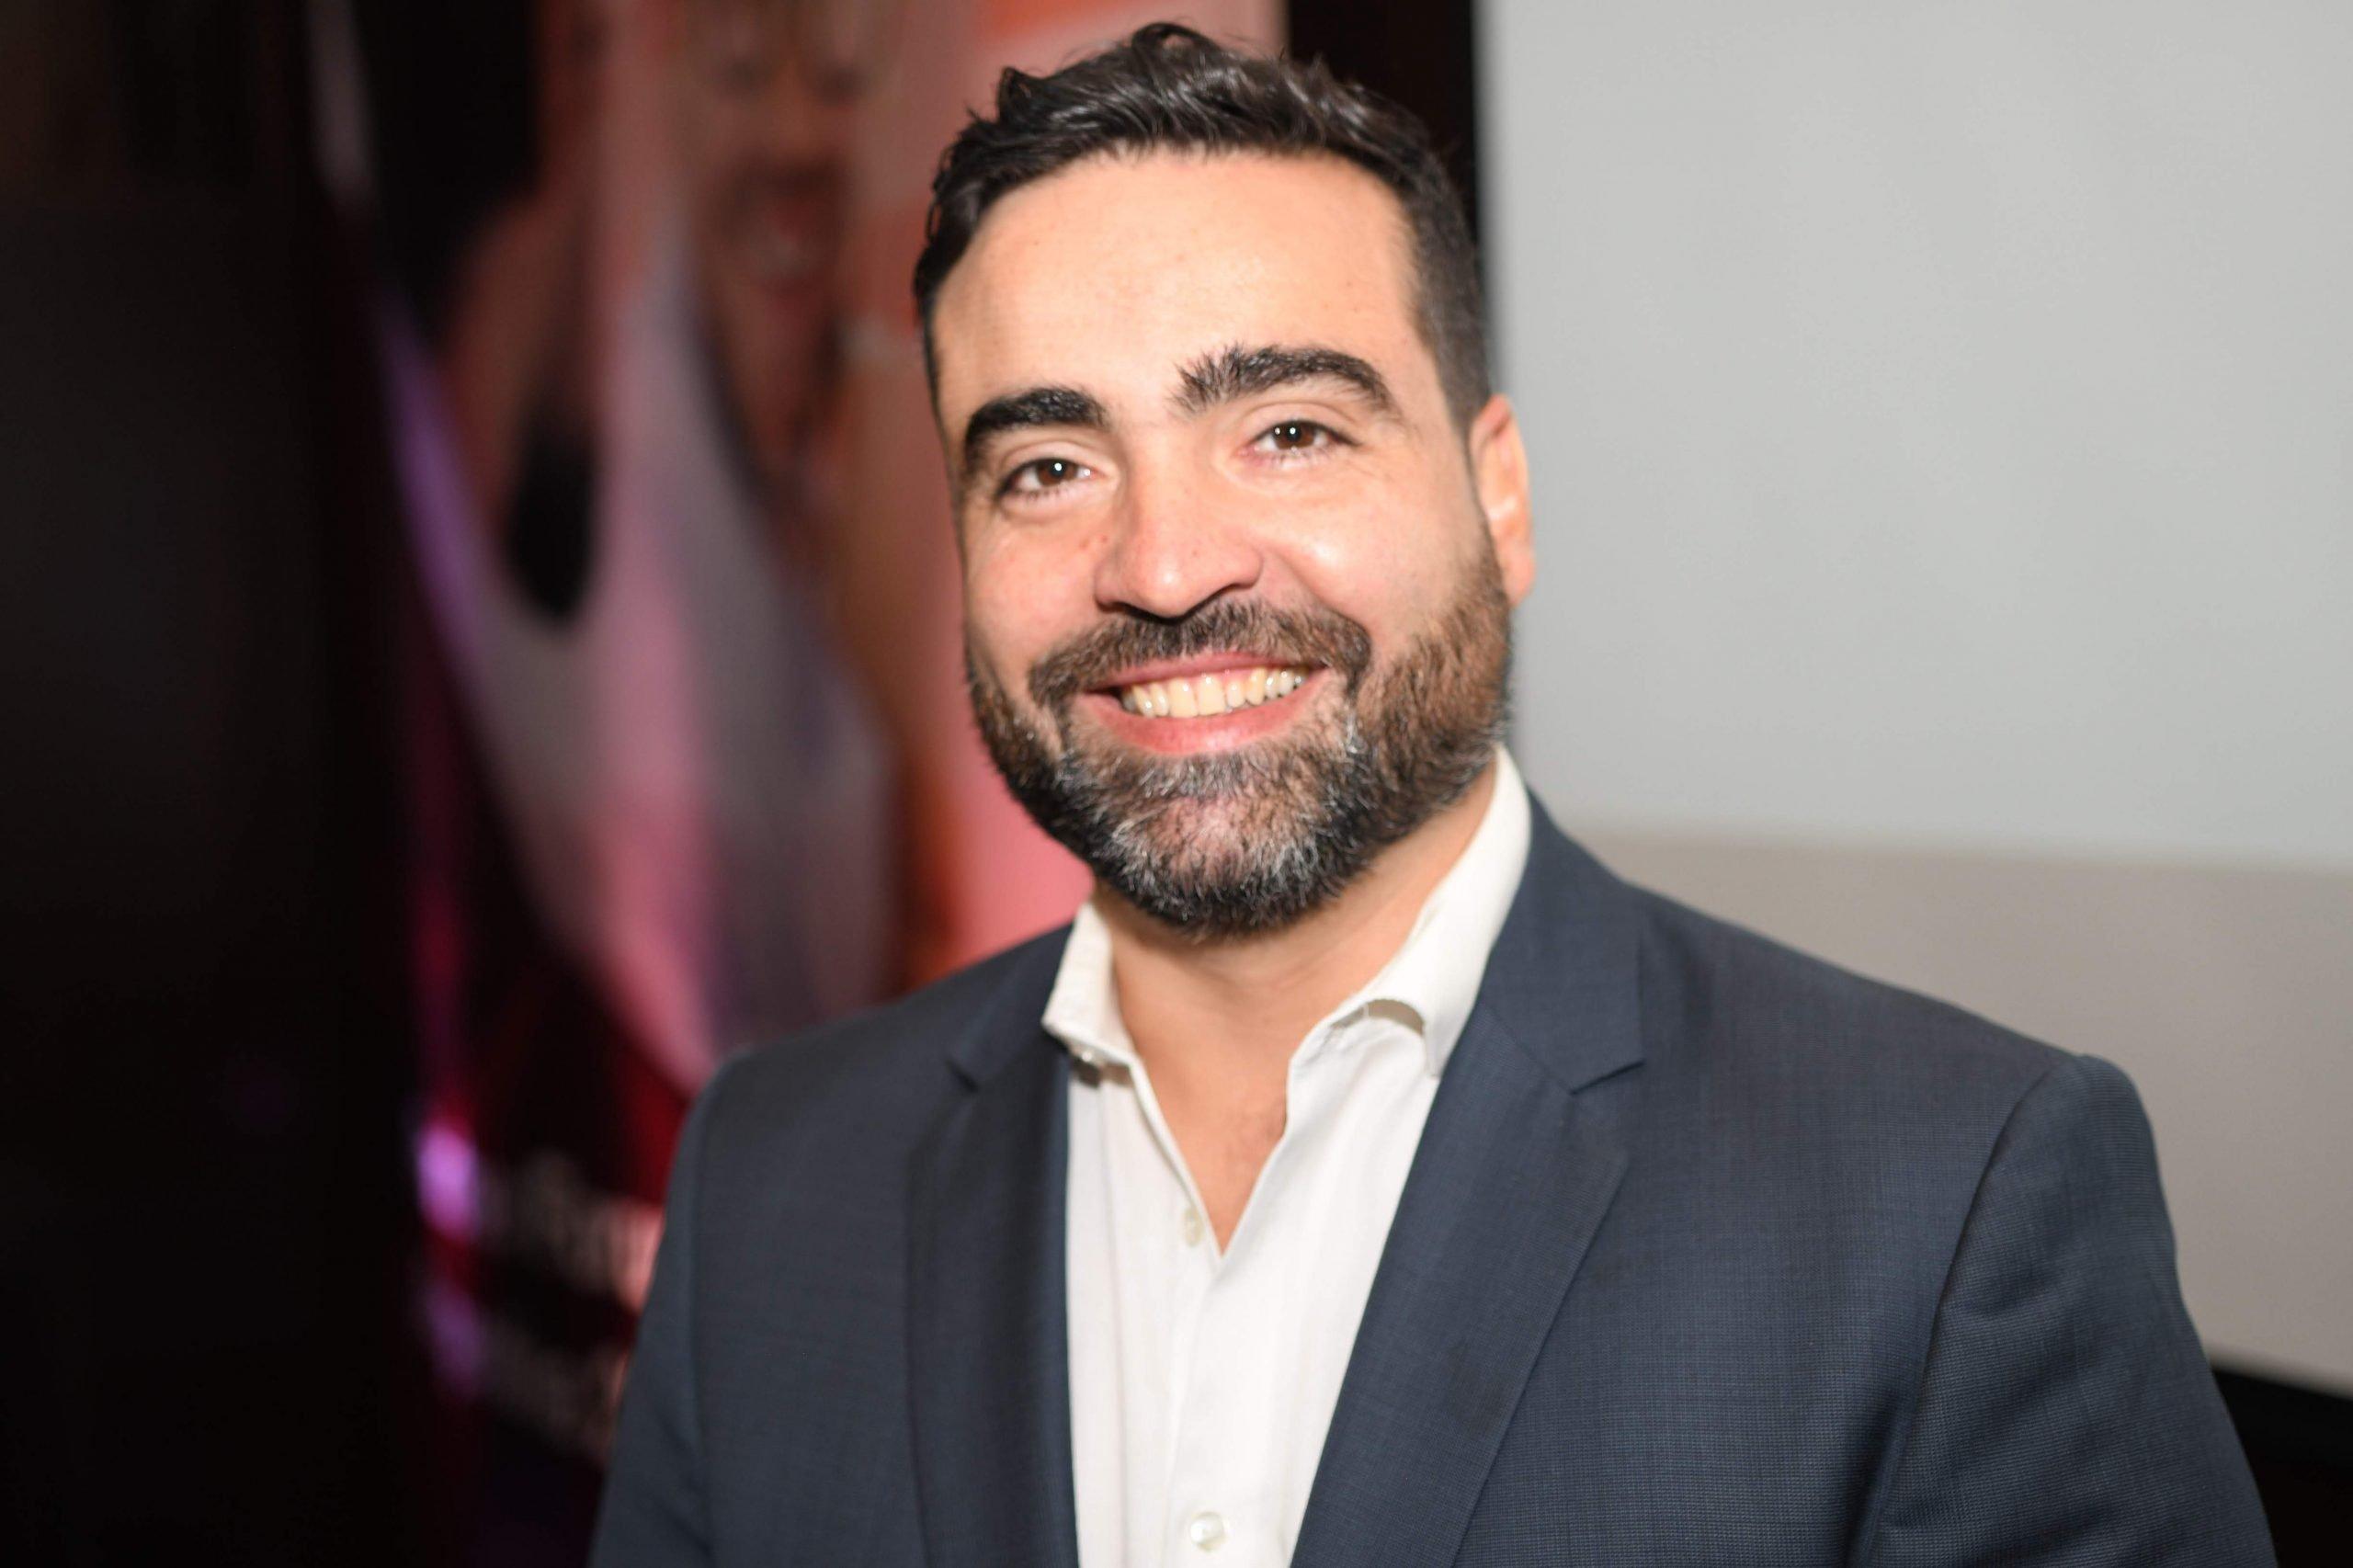 gonzalo garcía, vicepresidente de fortinet para sudamérica 2 (2)